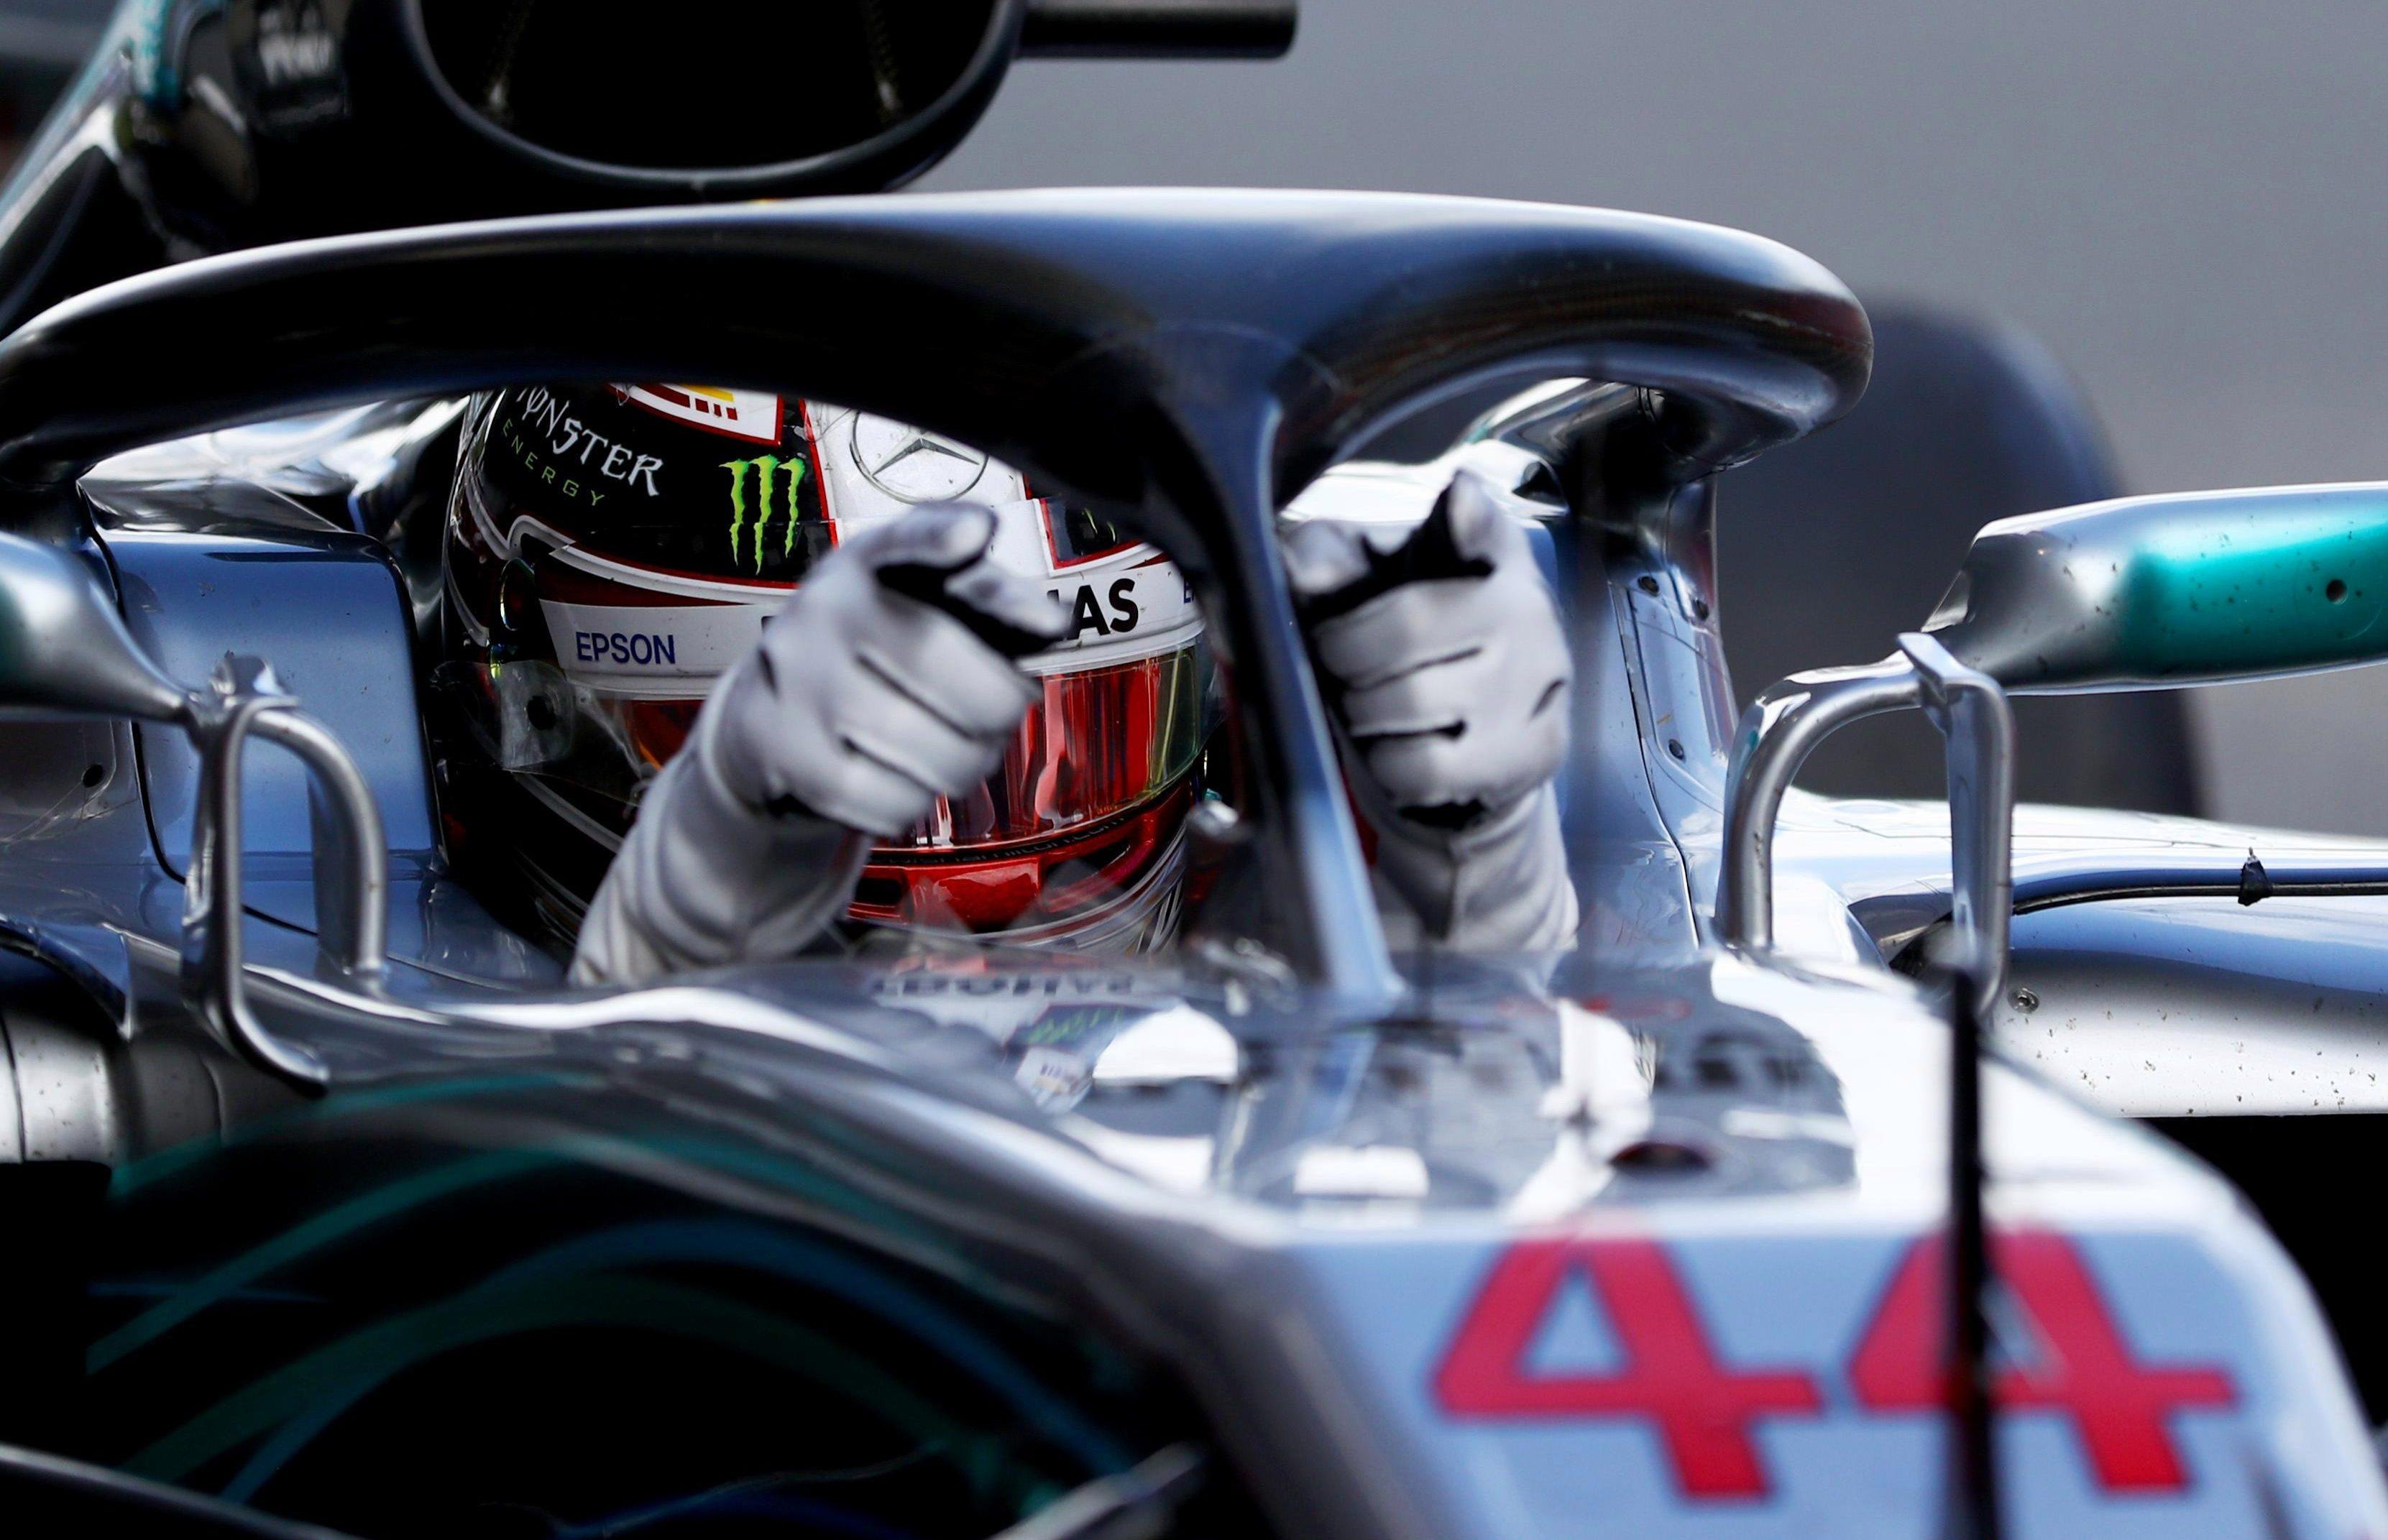 Lewis Hamilton is 17 points clear of Sebastian Vettel